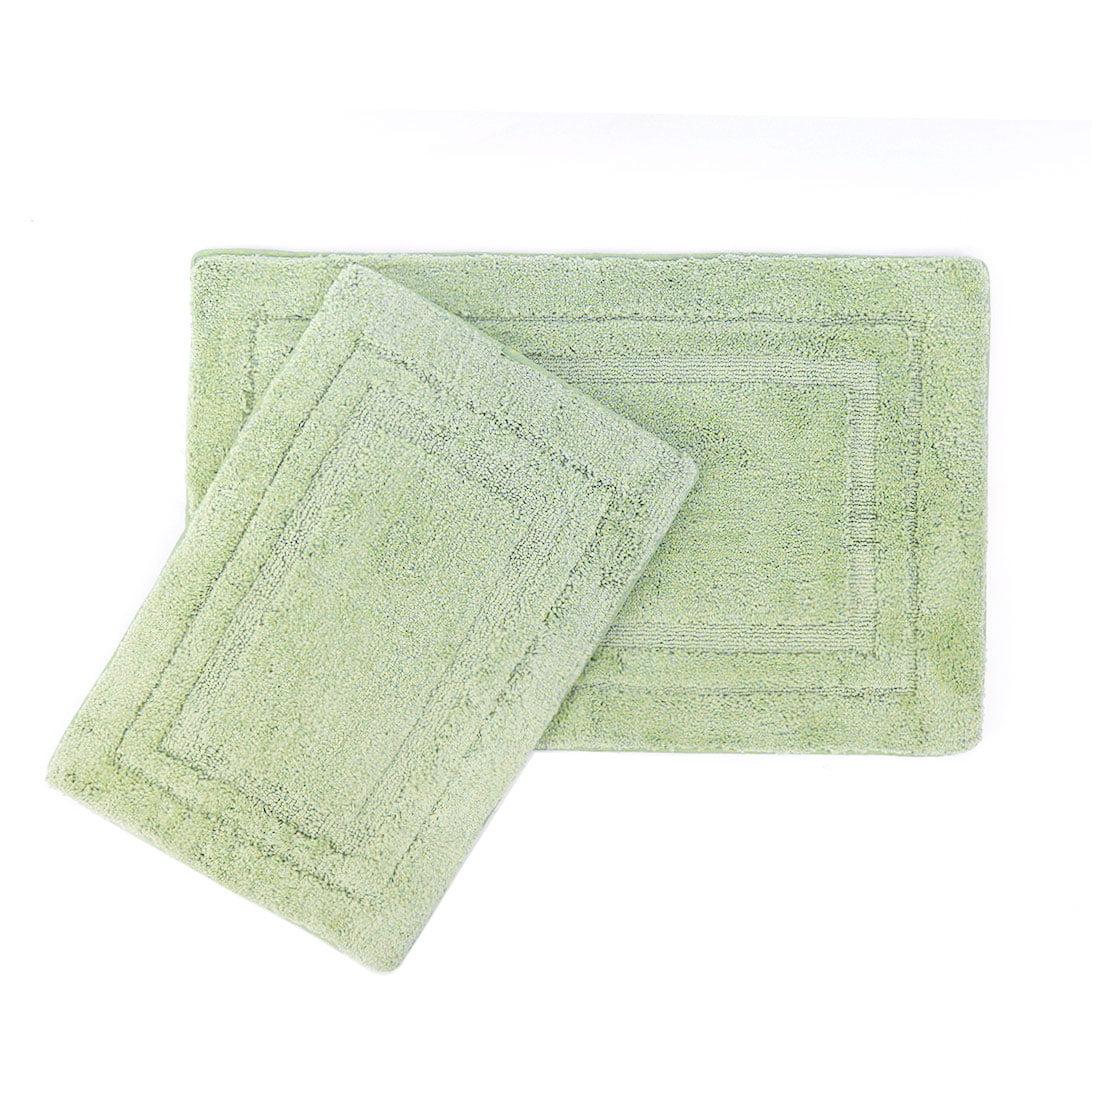 Dark Green Leaves Door Mat Bathroom Rug Bedroom Carpet Bath Mats Rug Non-Slip